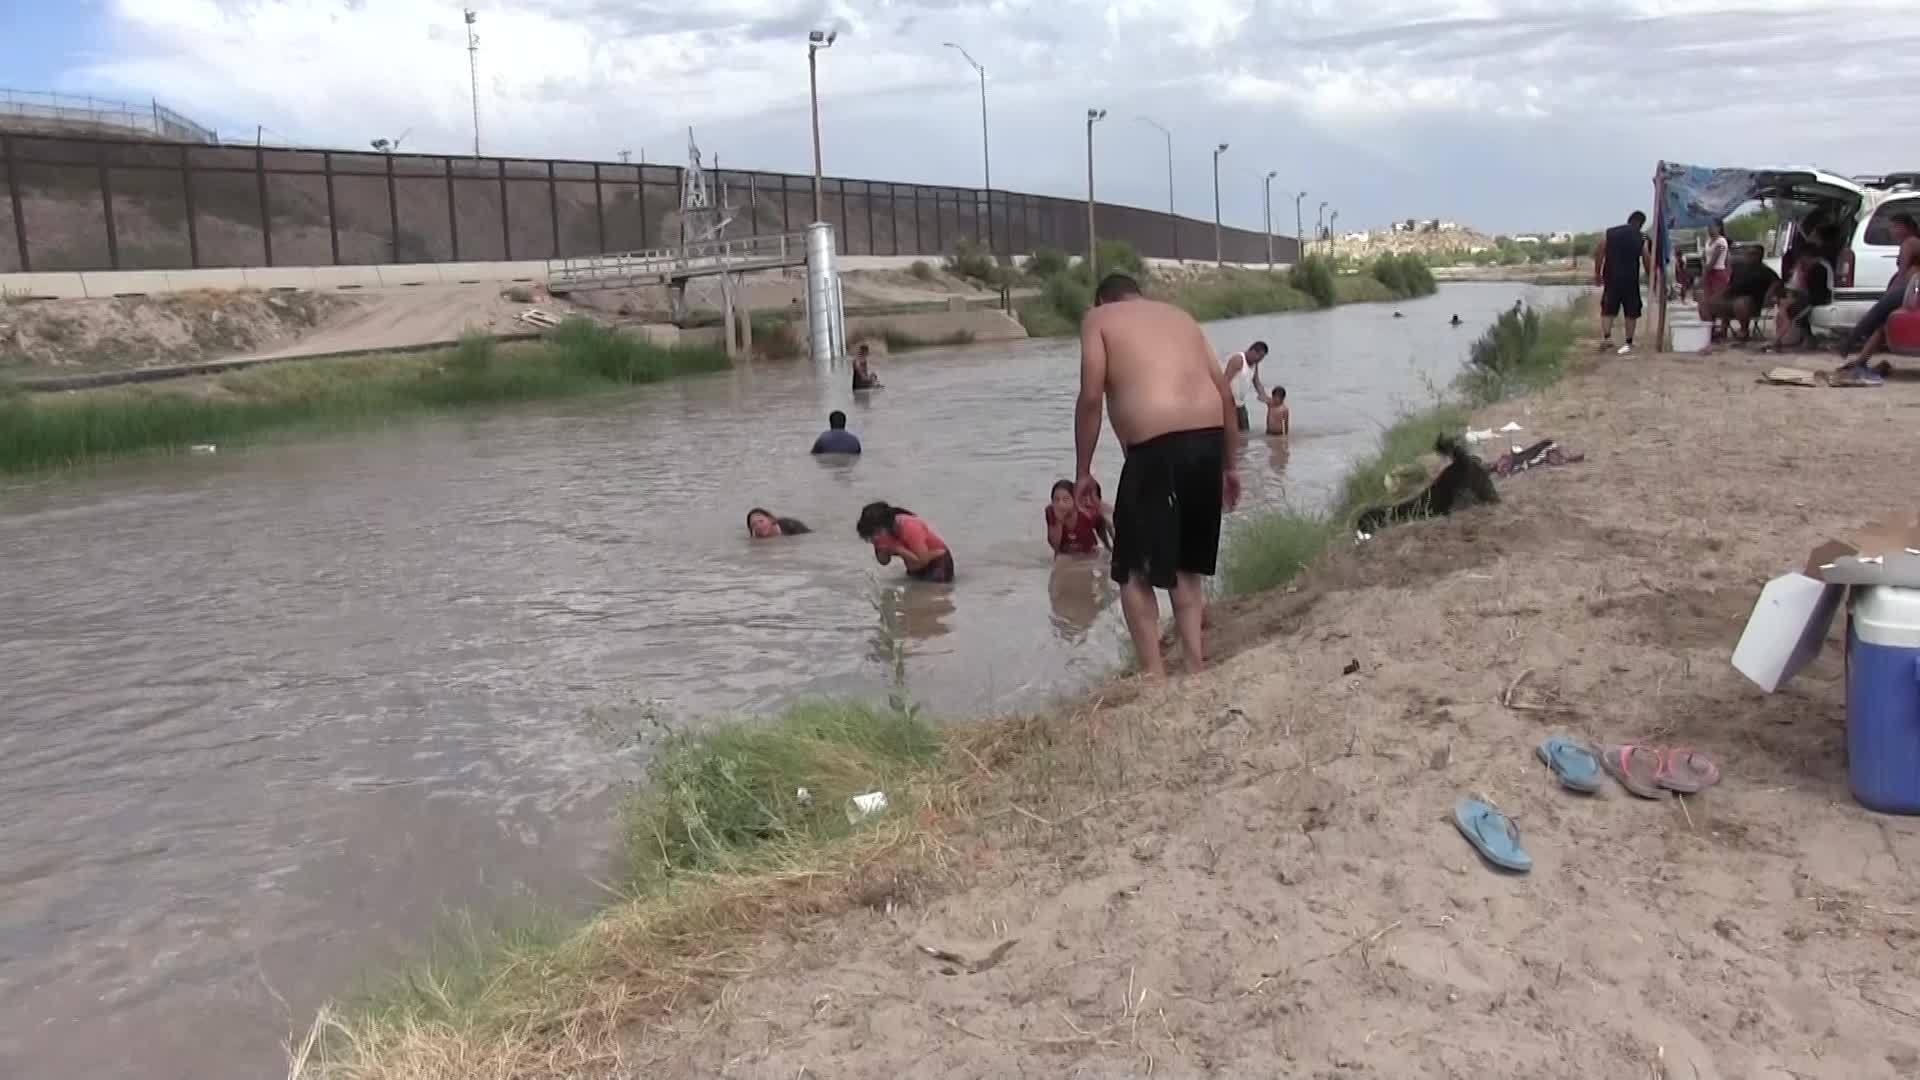 Juarez families enjoy Sunday on Rio Grande